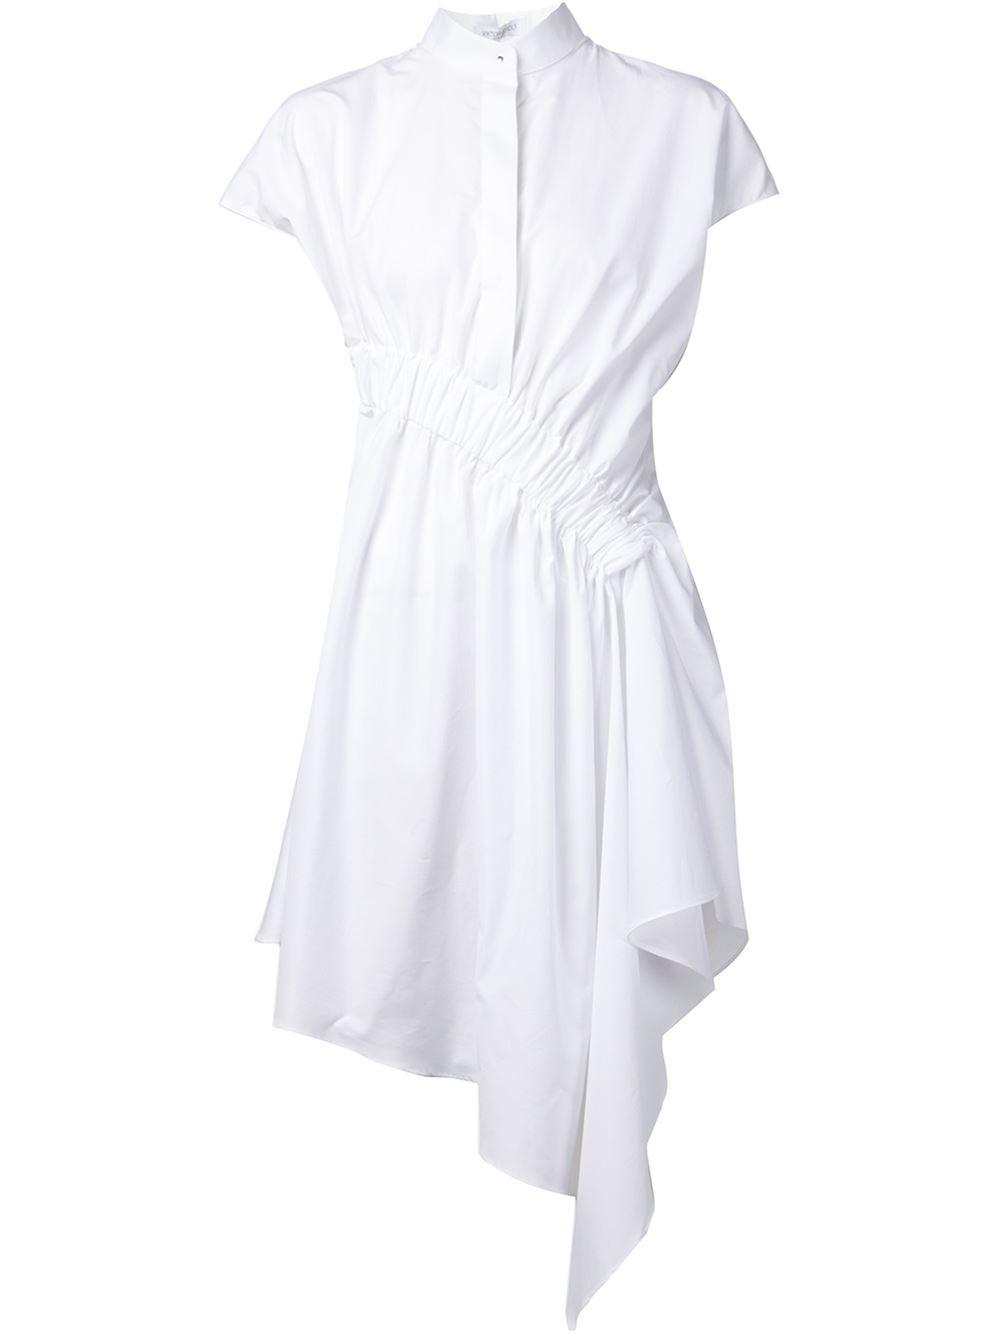 viktor rolf drape detail asymmetric shirt dress in black white save 50 lyst. Black Bedroom Furniture Sets. Home Design Ideas